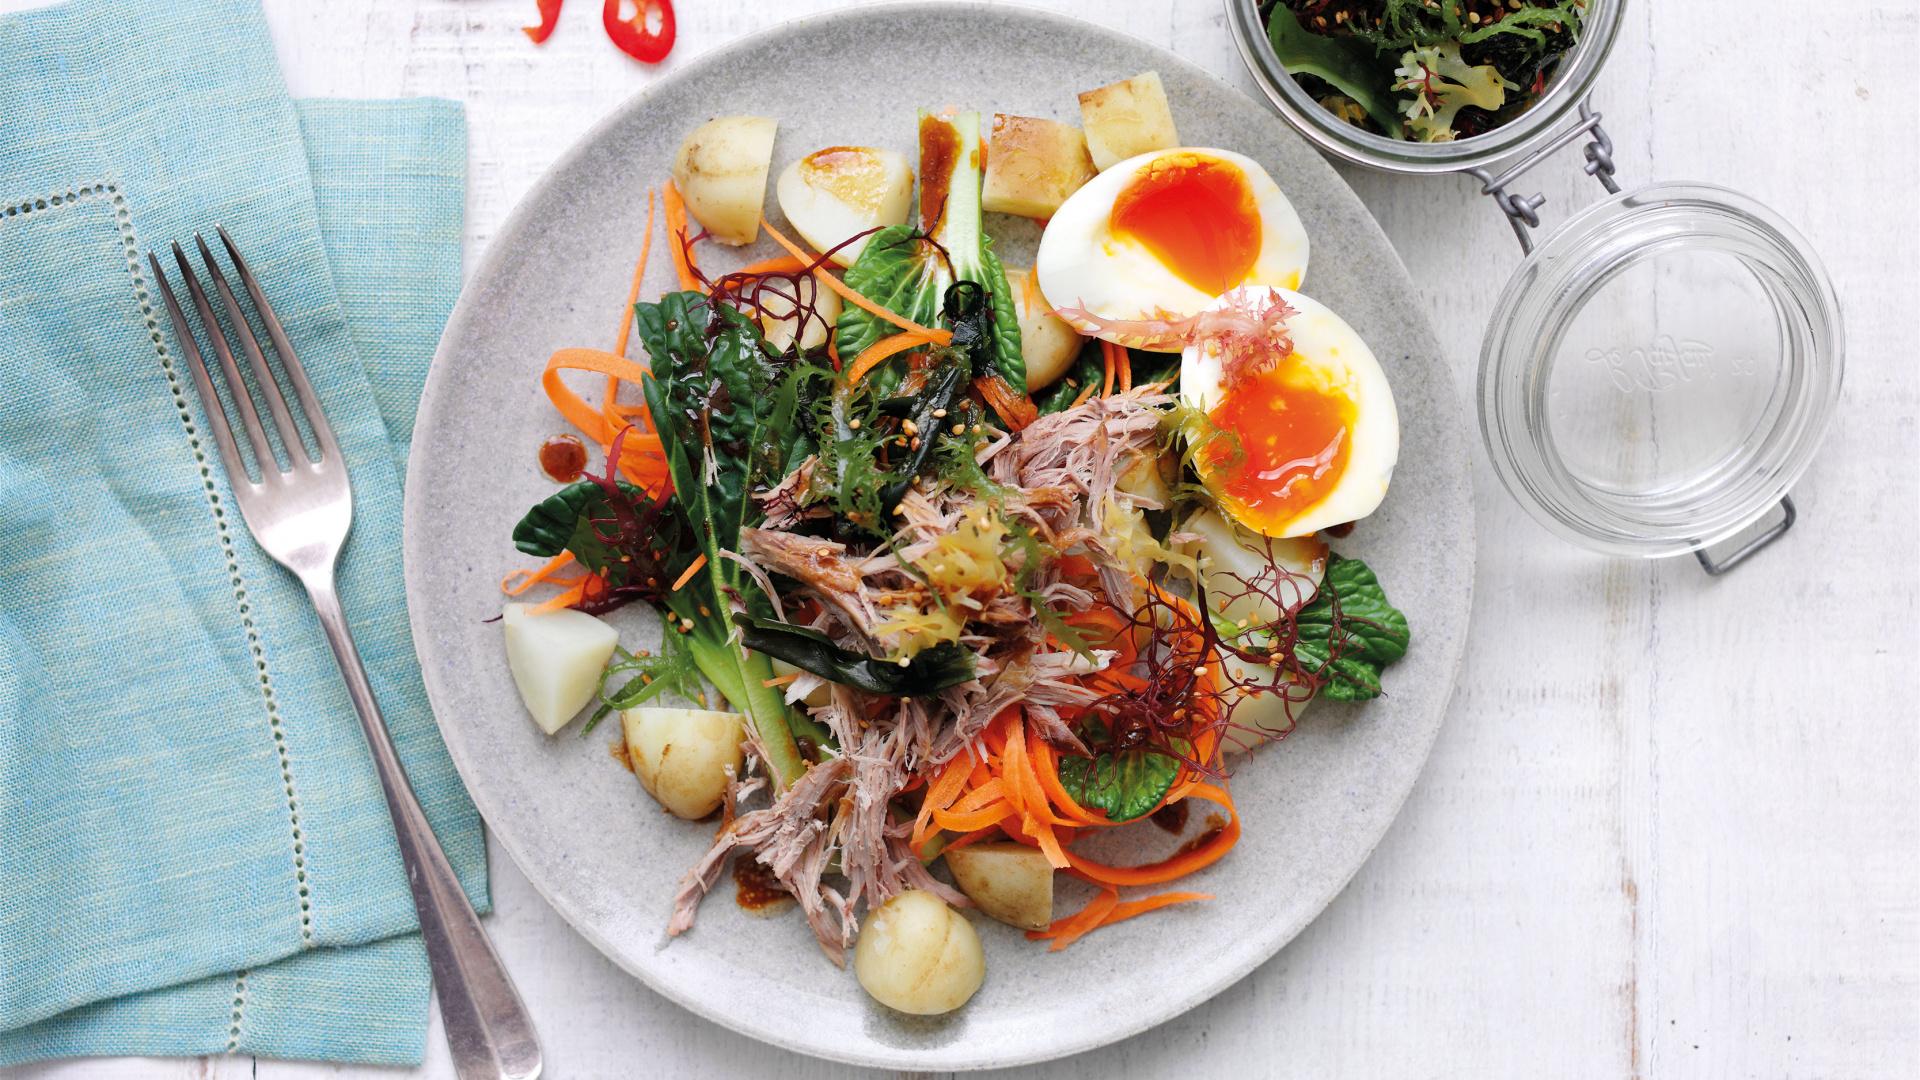 Warm Jersey Royal and seaweed salad